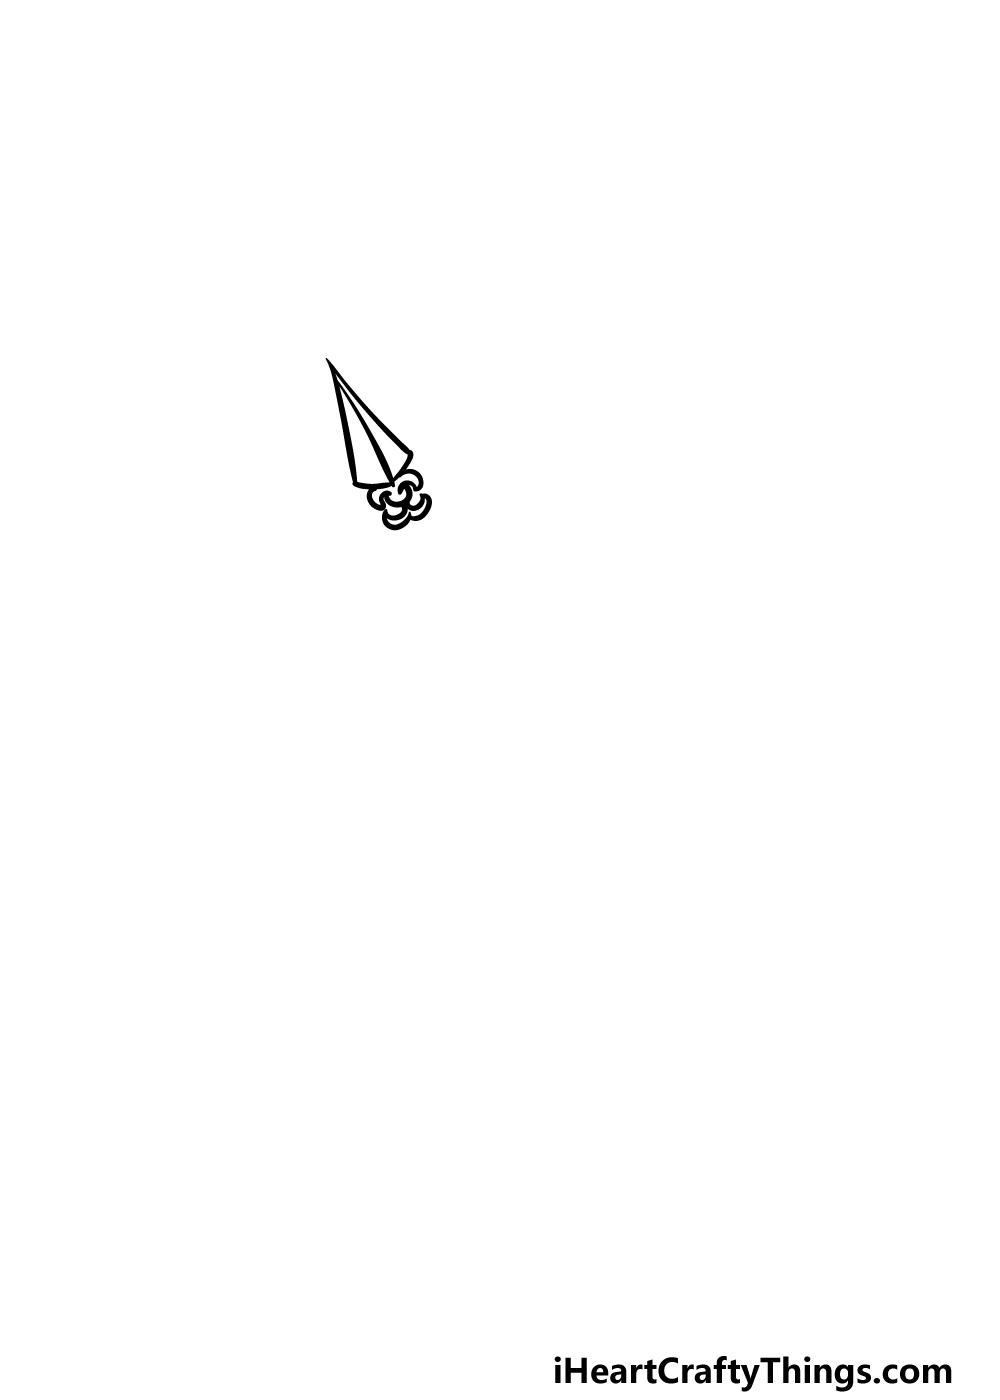 drawing an arrow step 1